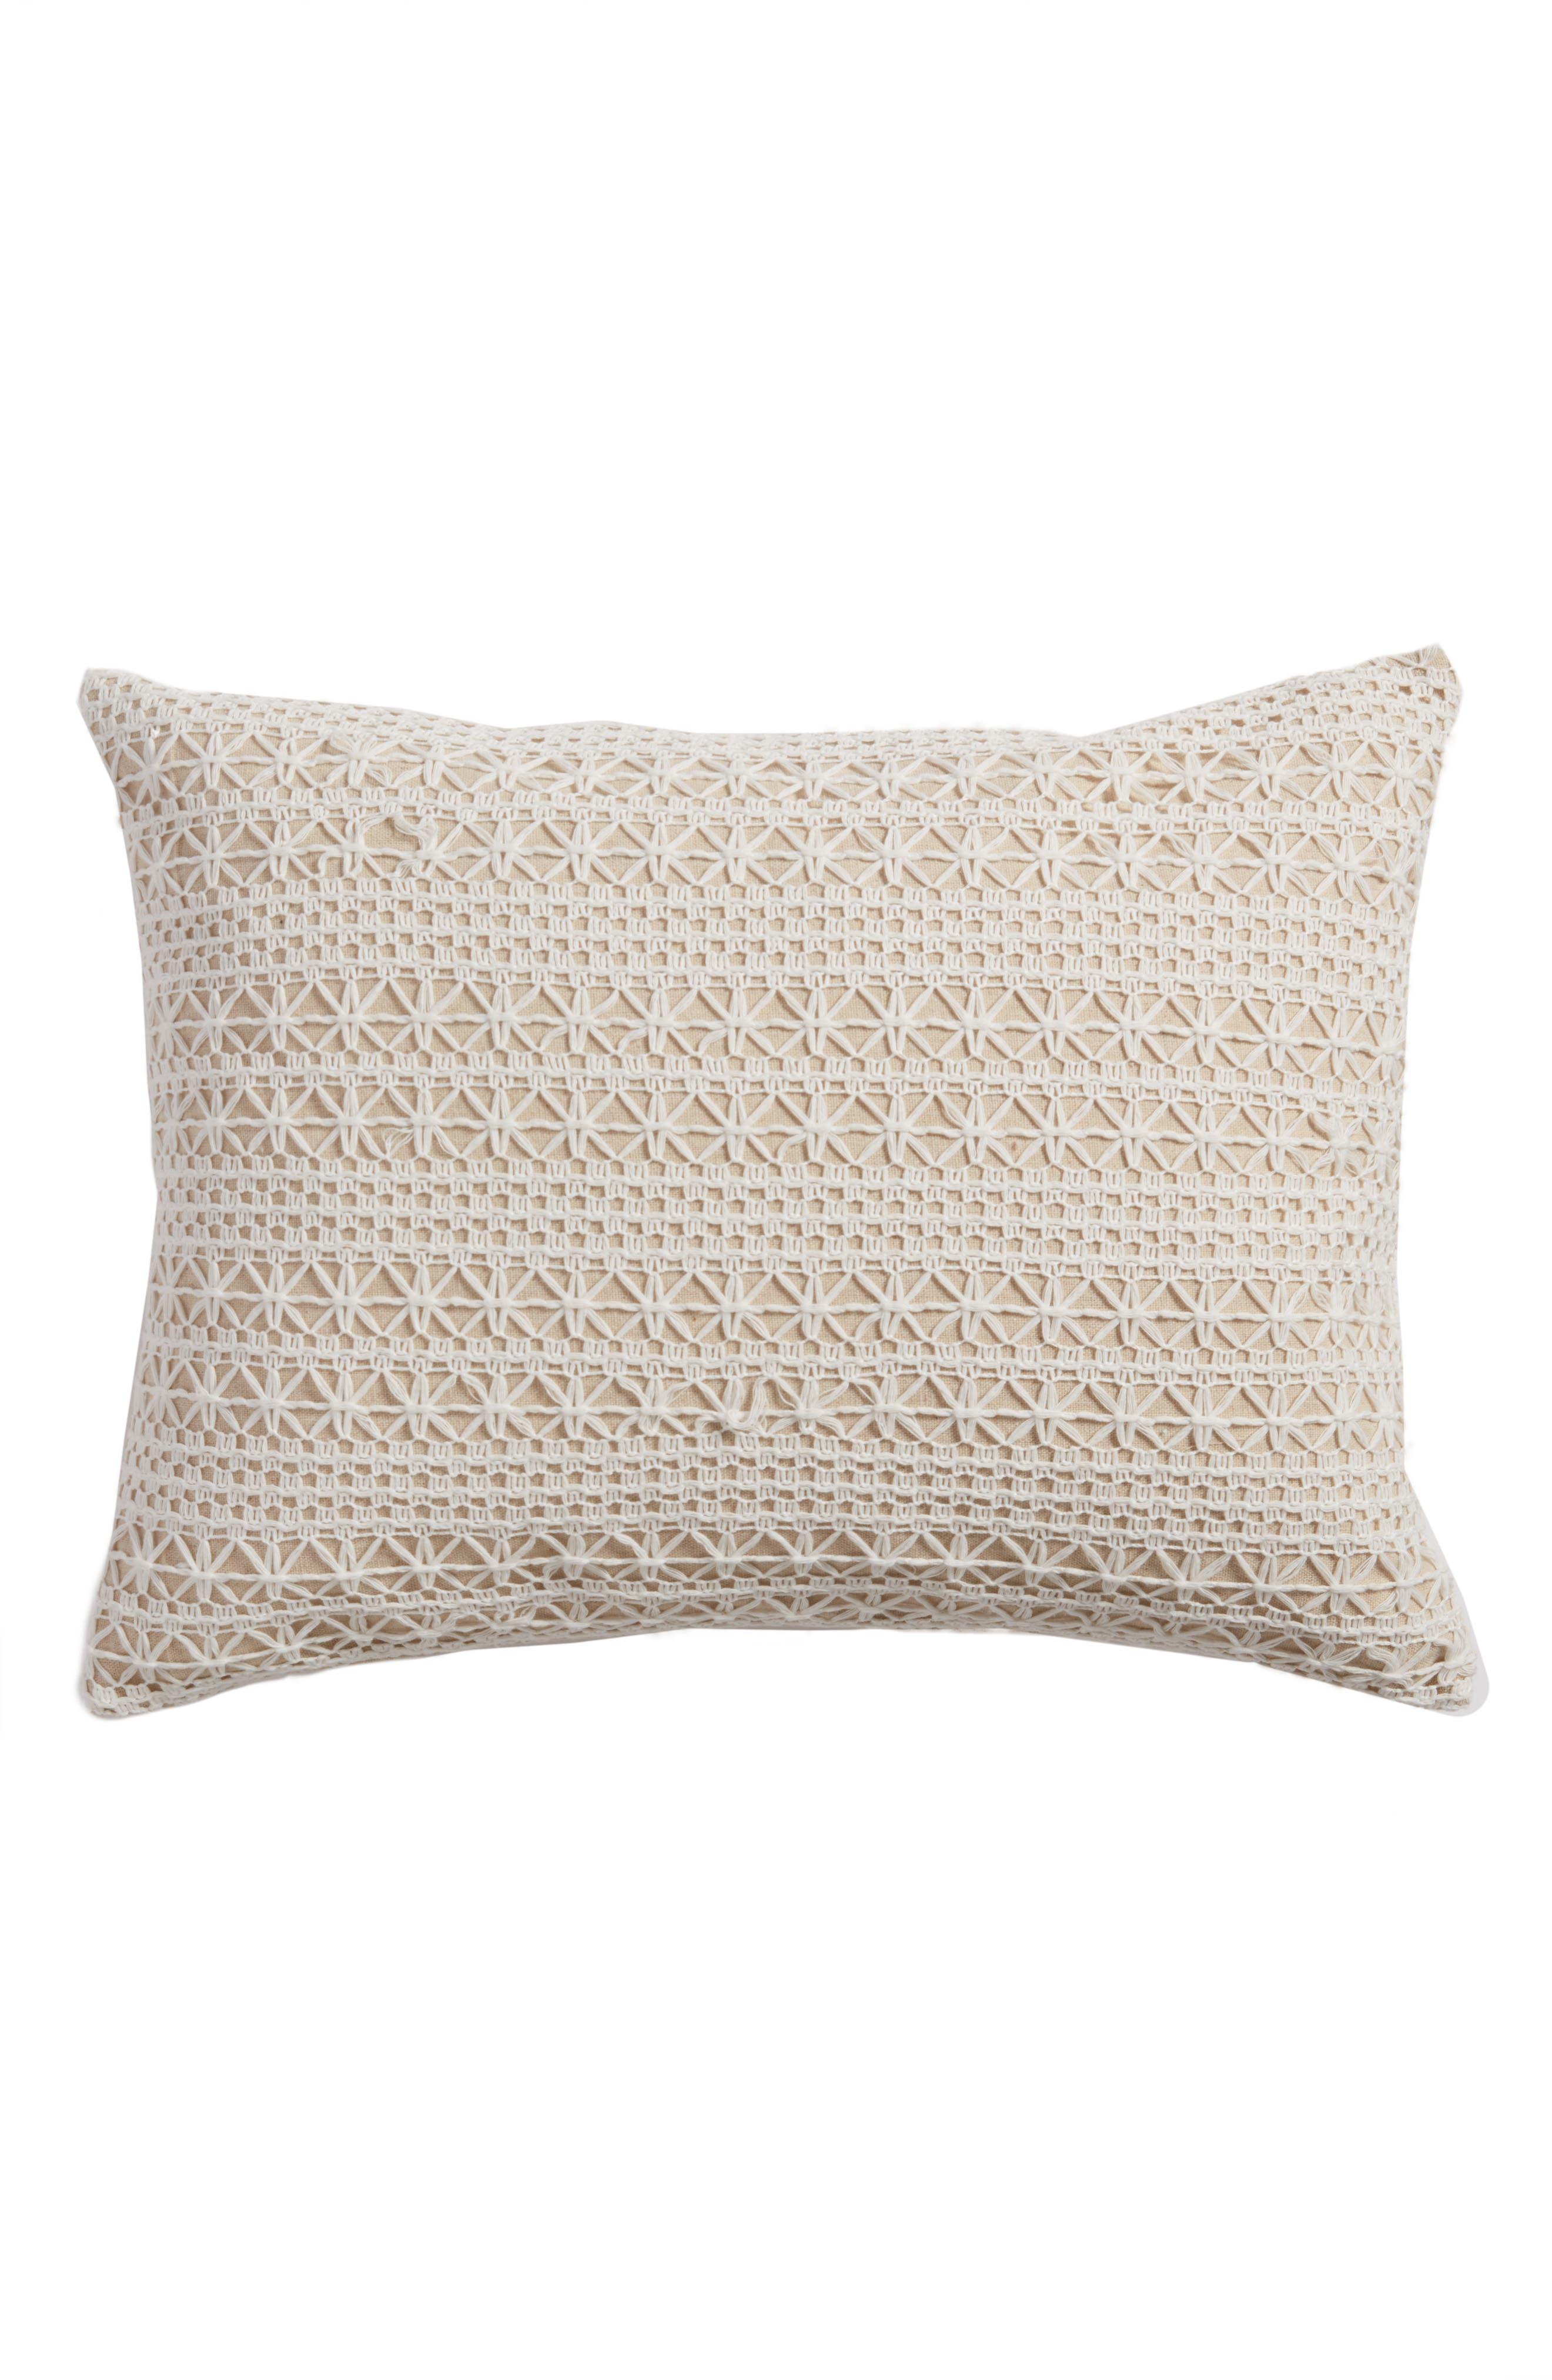 Arden Accent Pillow,                             Main thumbnail 1, color,                             Cream